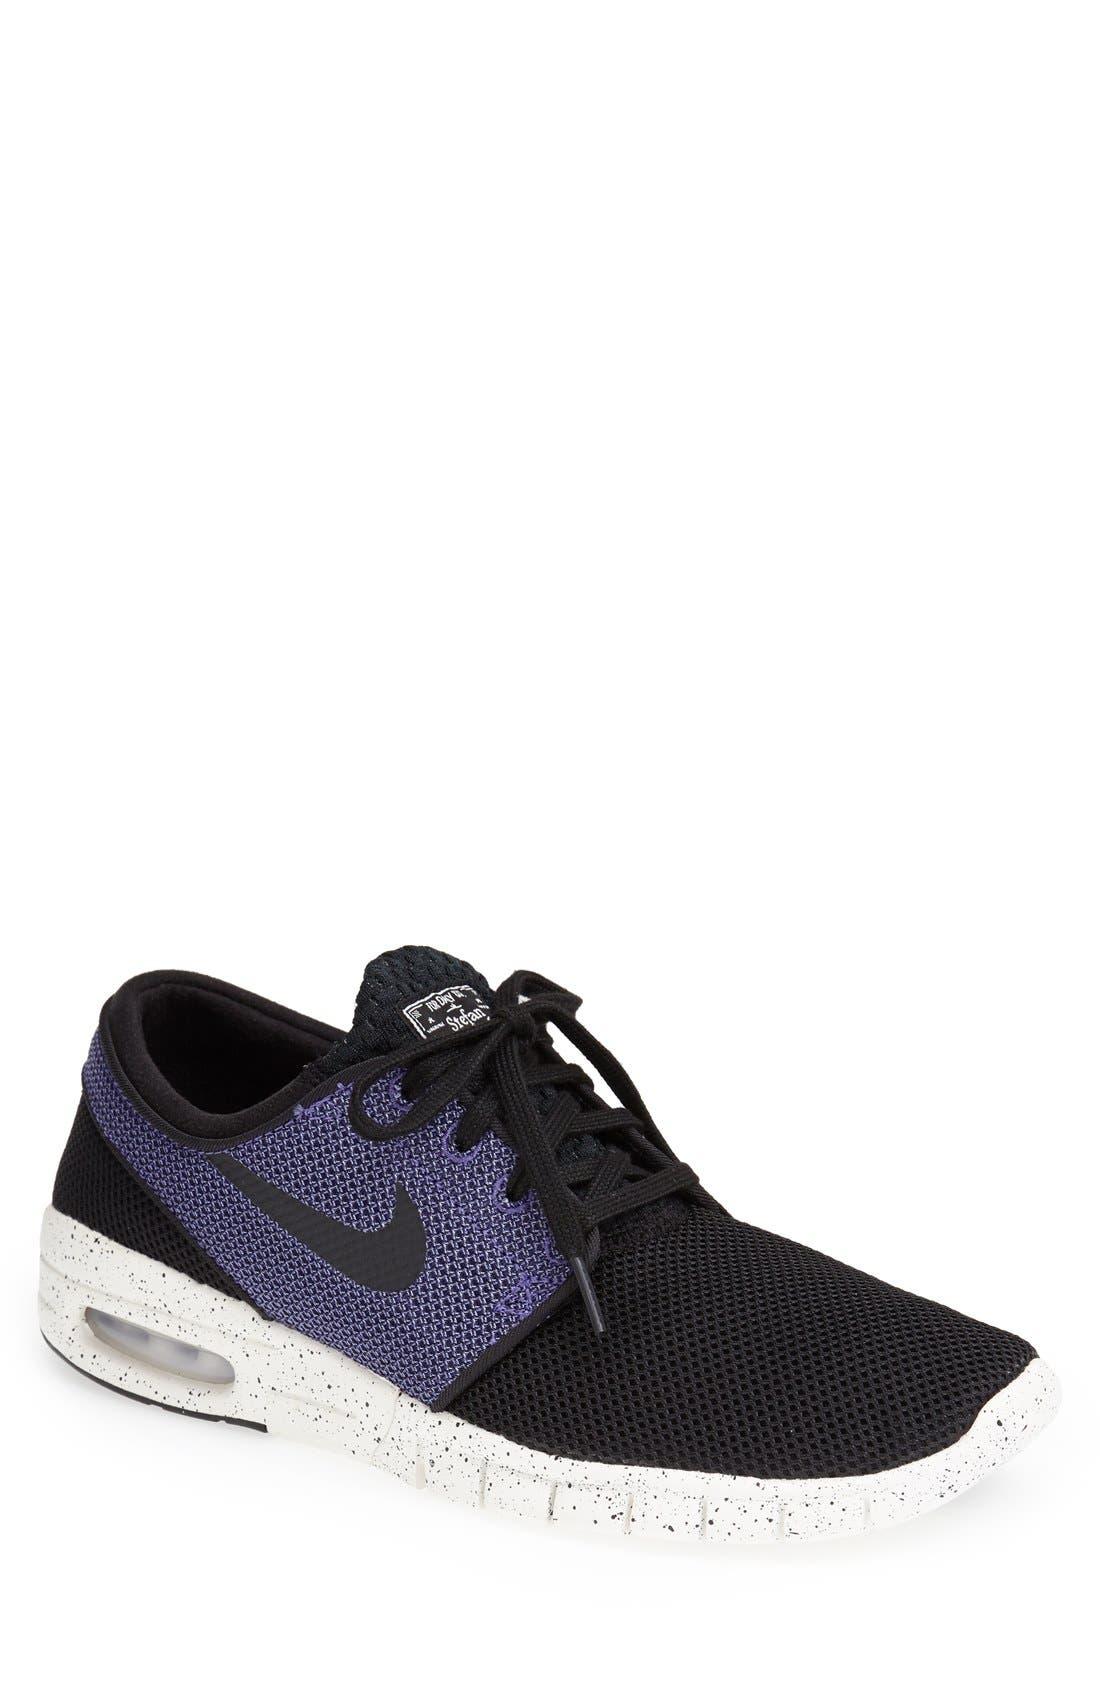 'Stefan Janoski - Max SB' Skate Shoe,                         Main,                         color, BLACK/ PRO PURPLE/ WHITE